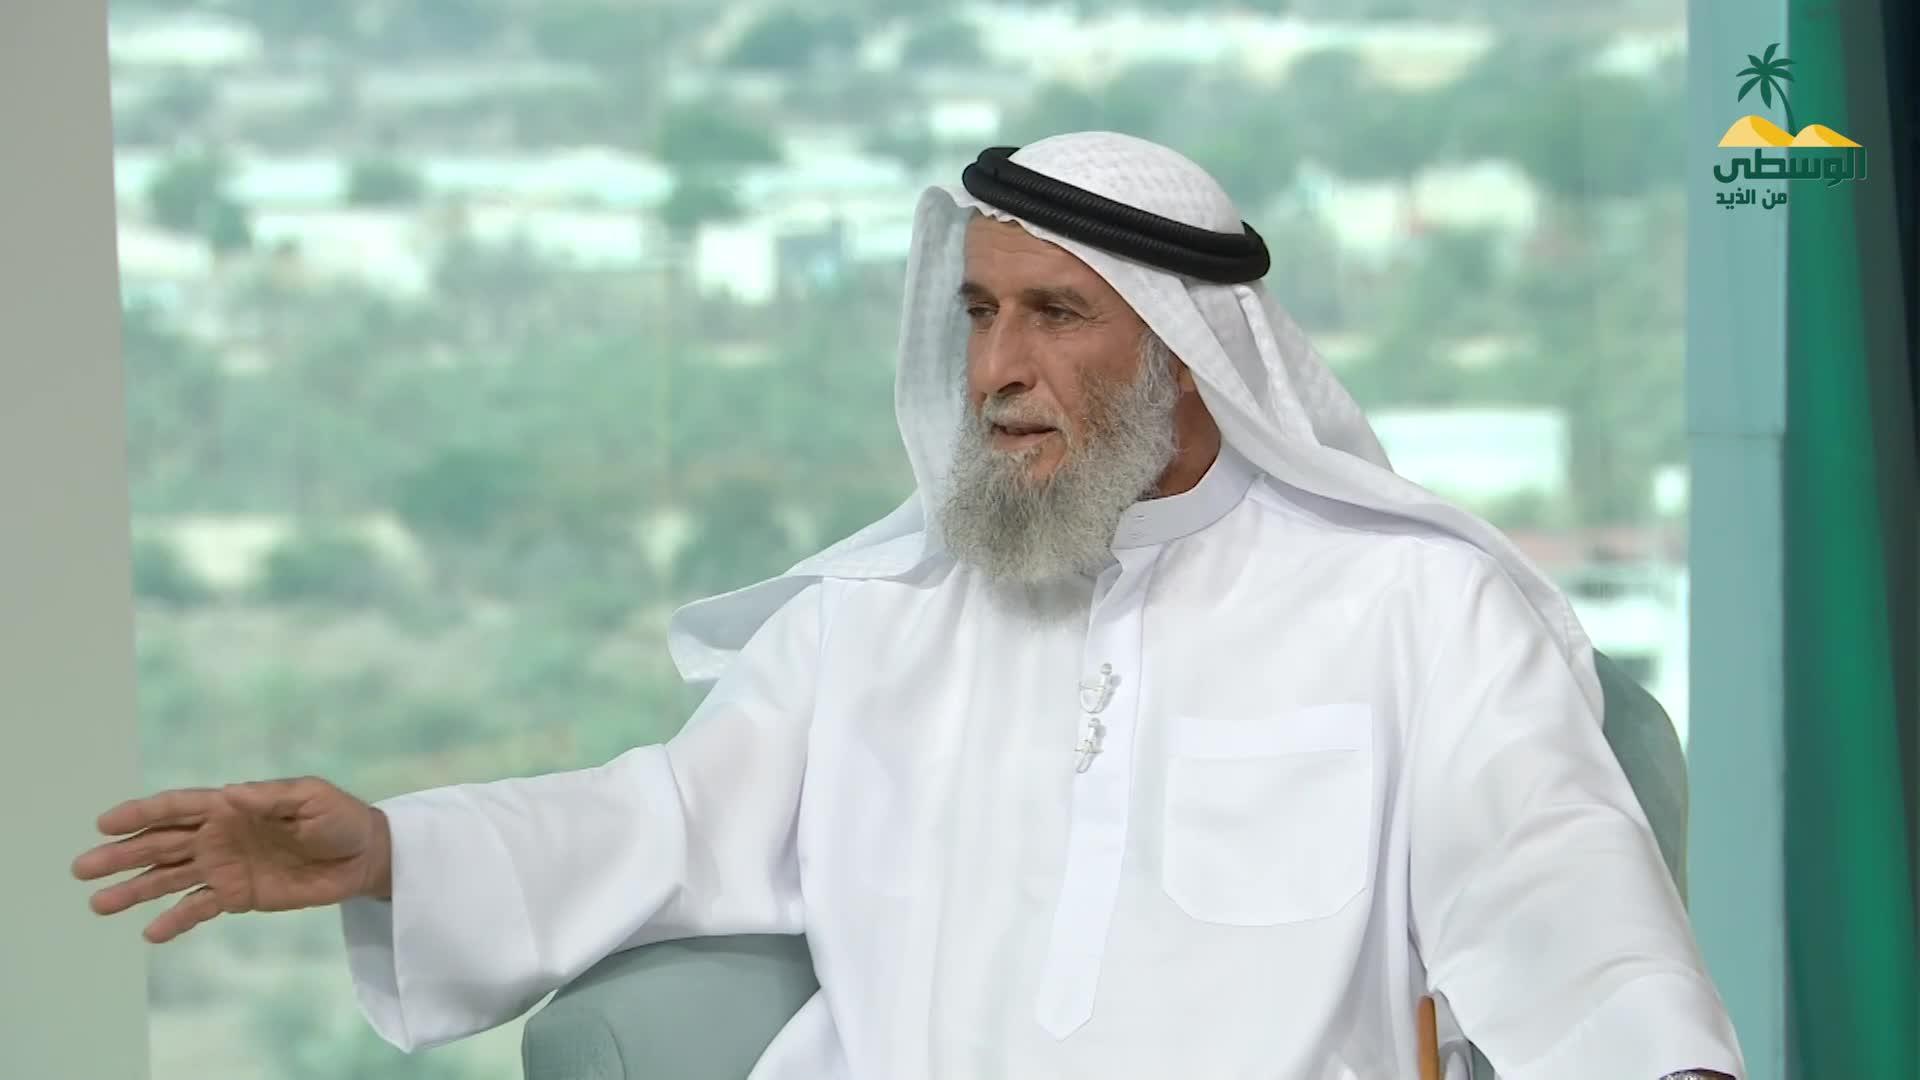 يوميات الوسطى - عبدالله راشد بن مرخان الكتبي - د. مأمون الحريري